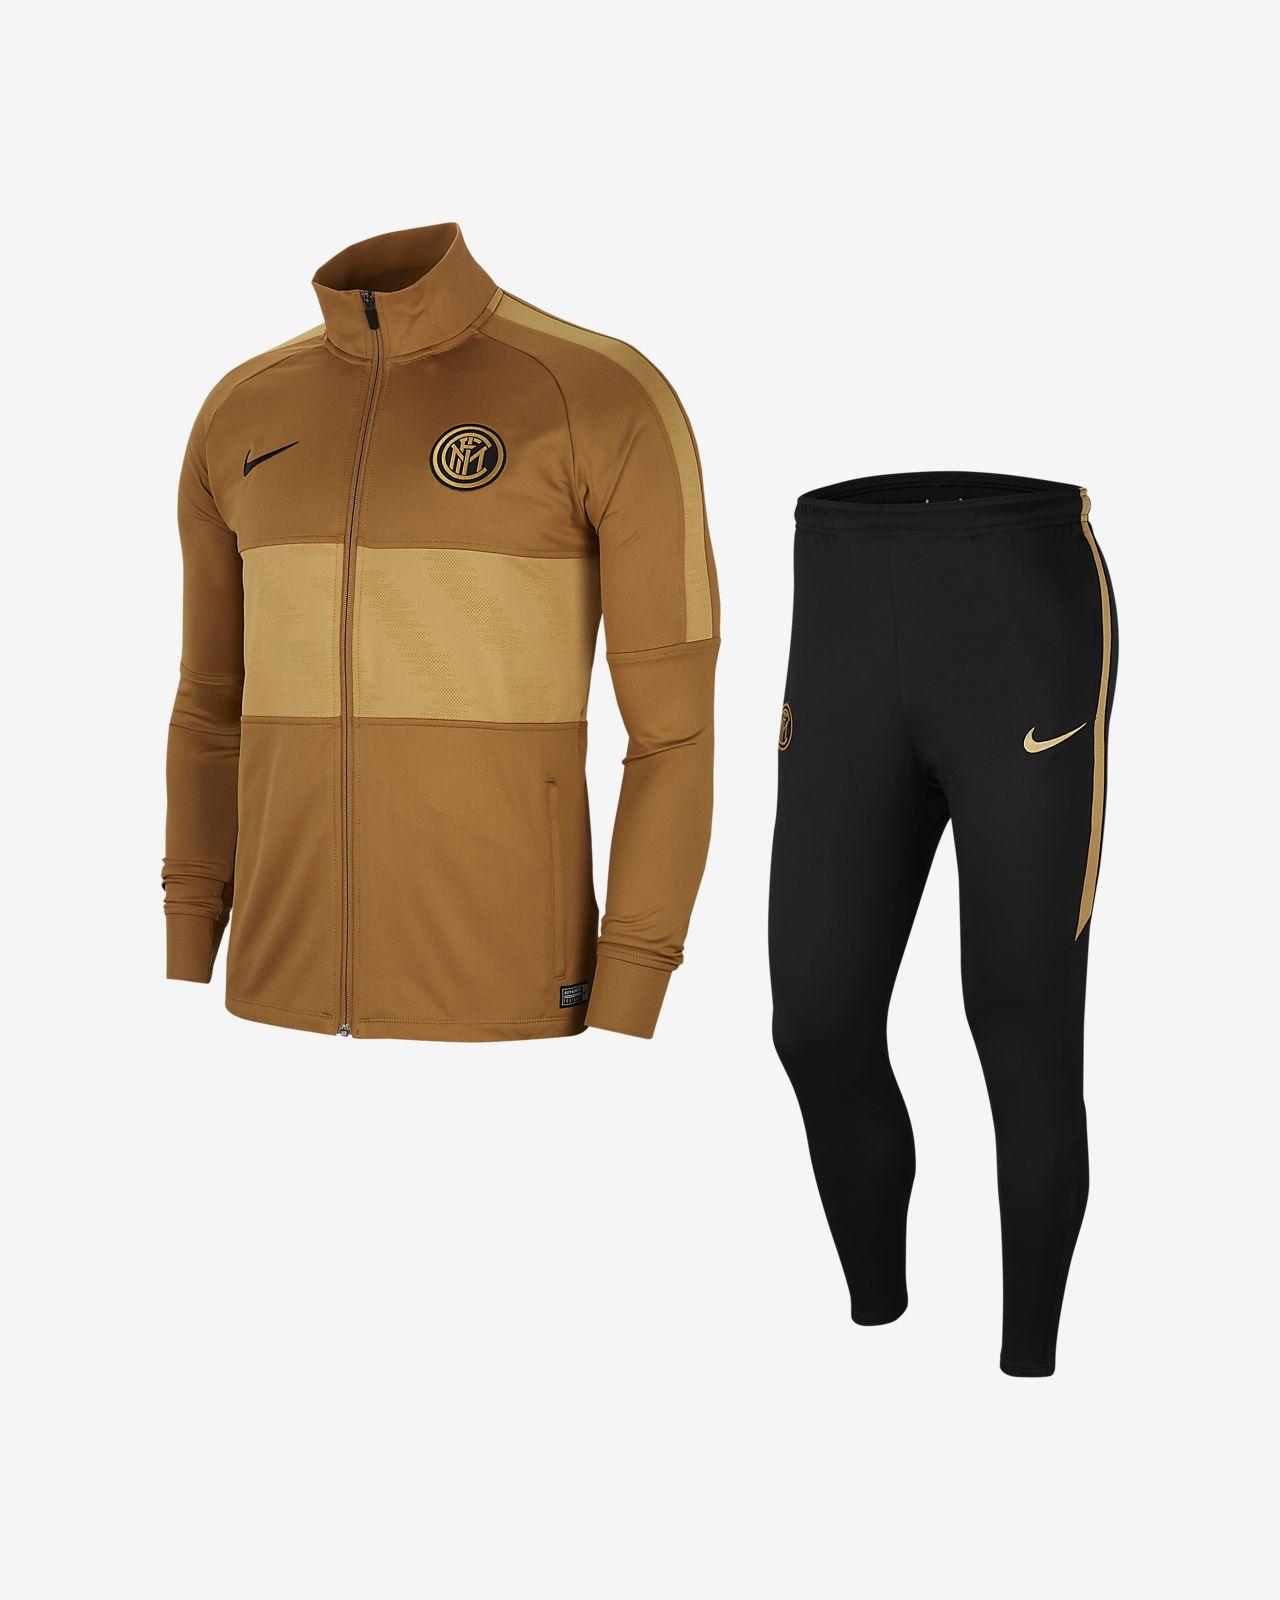 Details about Nike Academy Dri Fit Warm Up Tracksuit Jacket Top Mens XL Full Zip BLACKORANGE